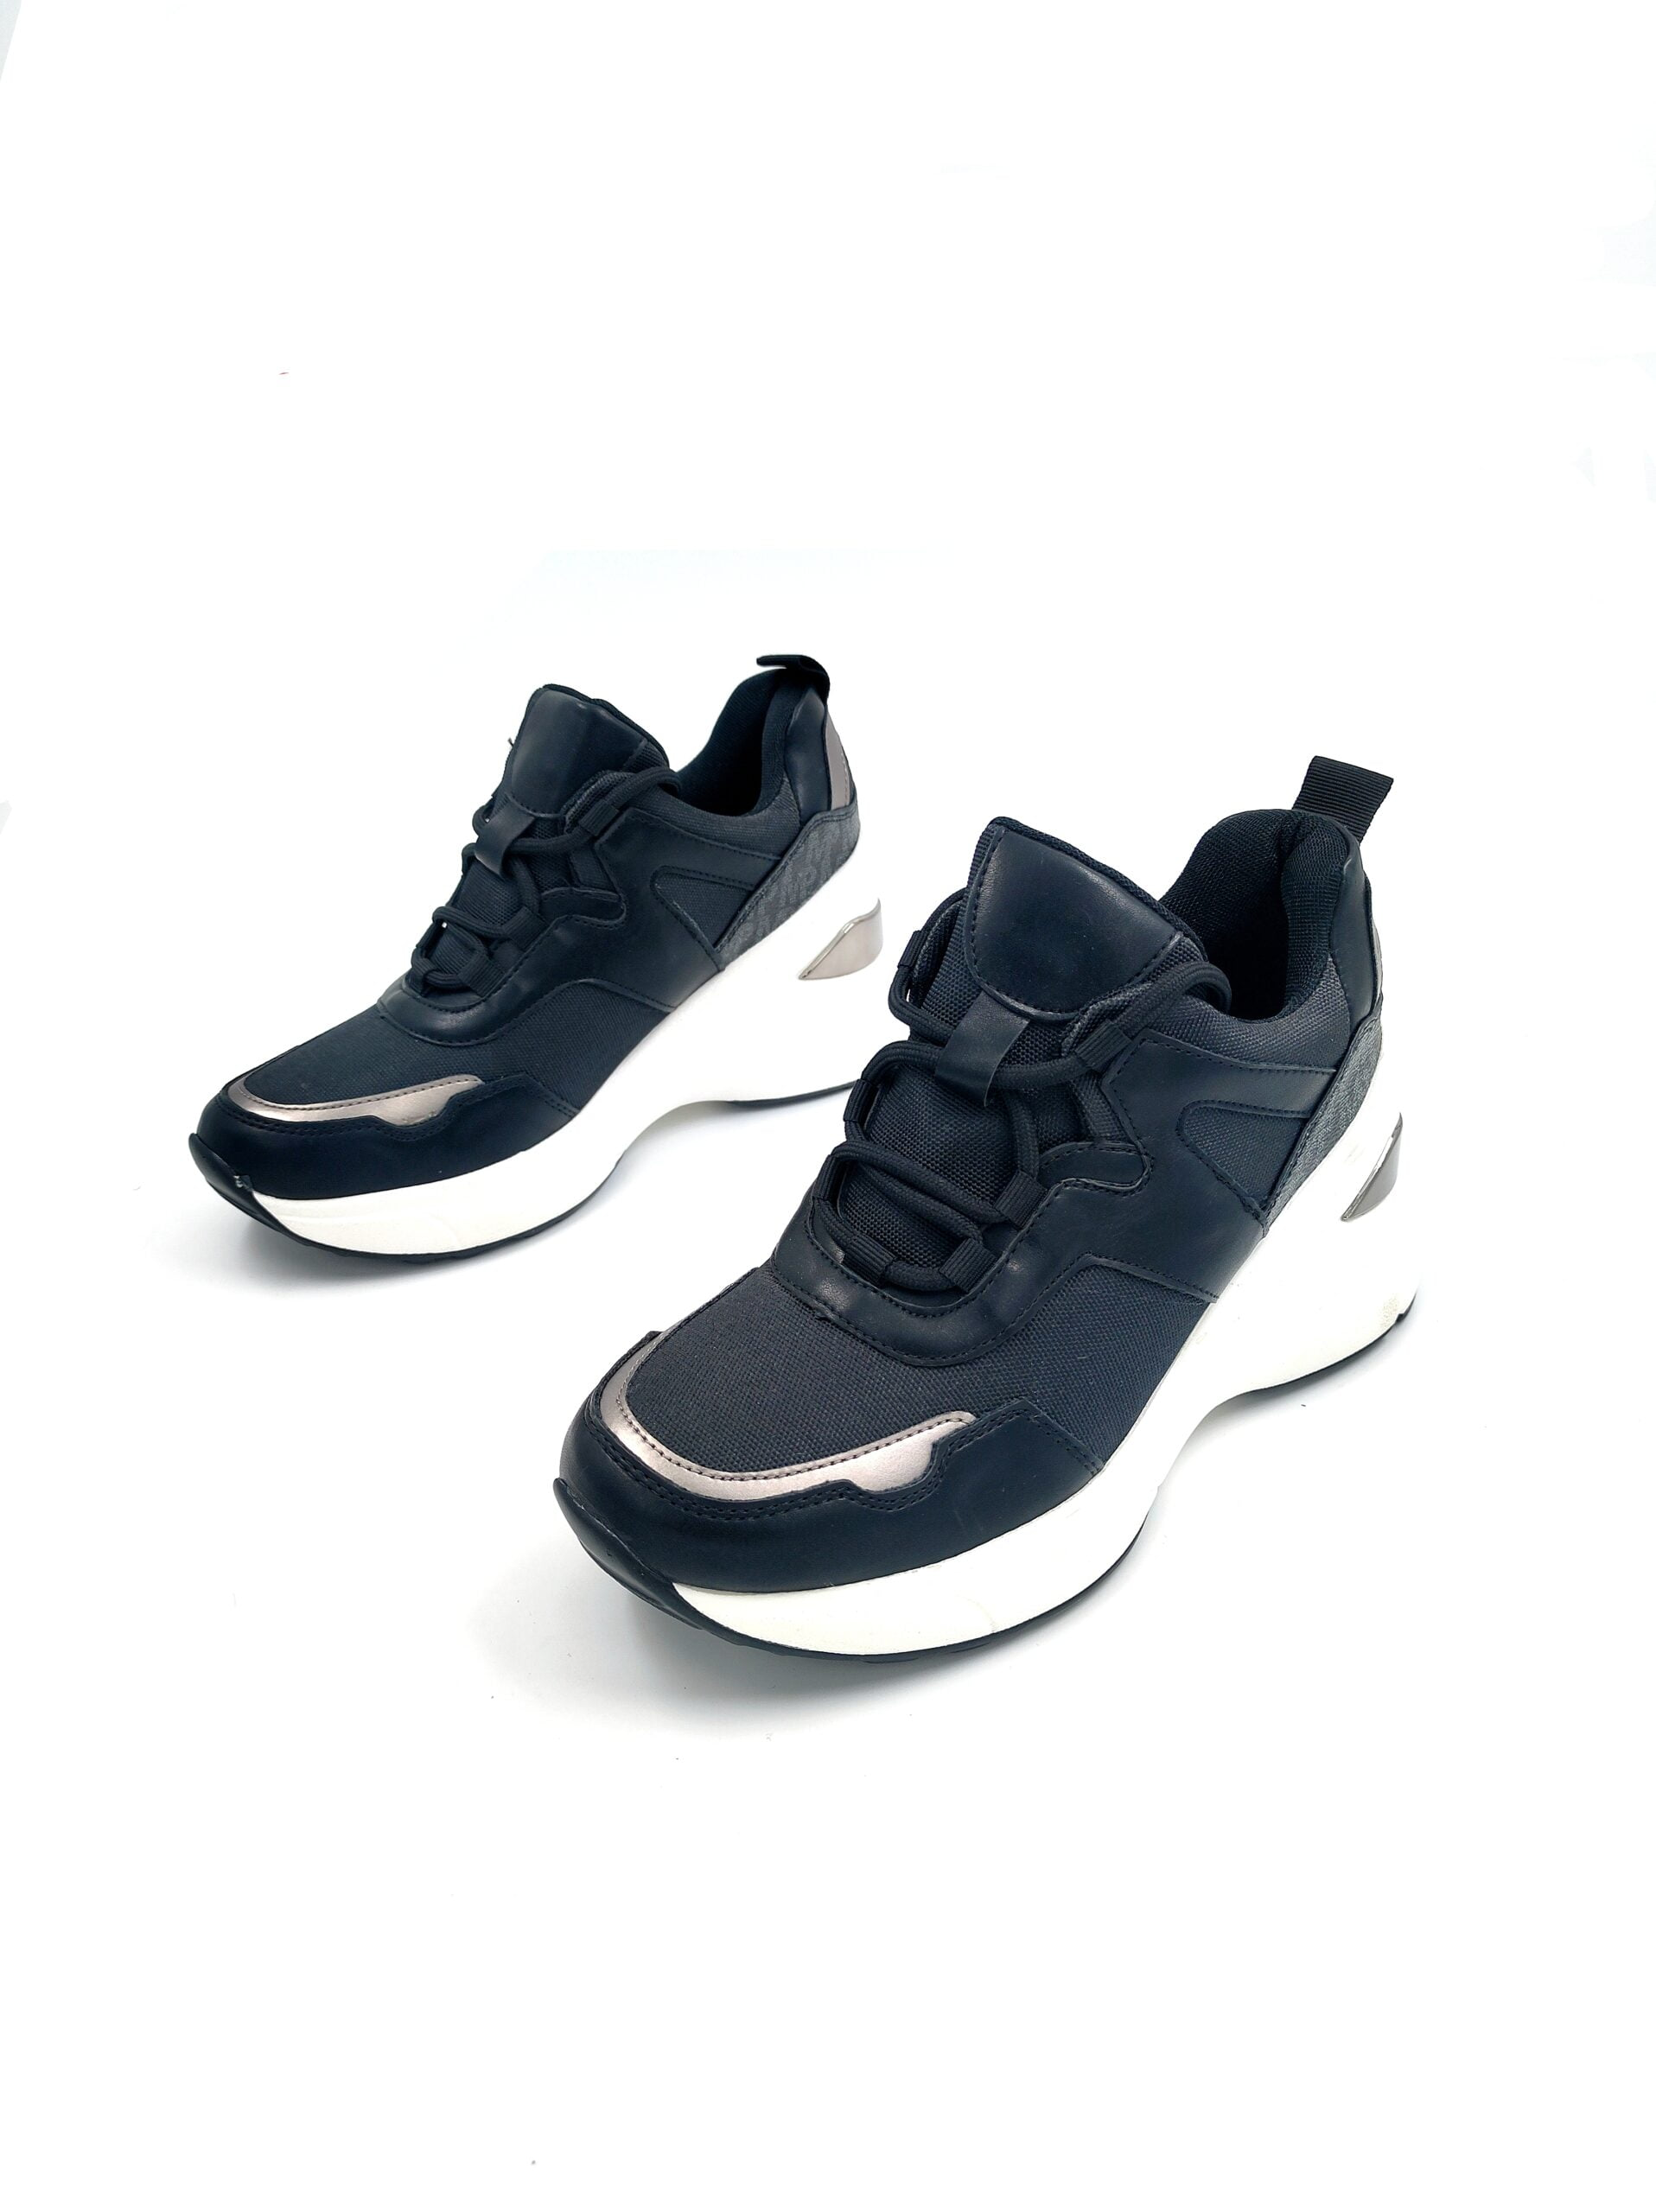 Sneakers Ψηλά Black